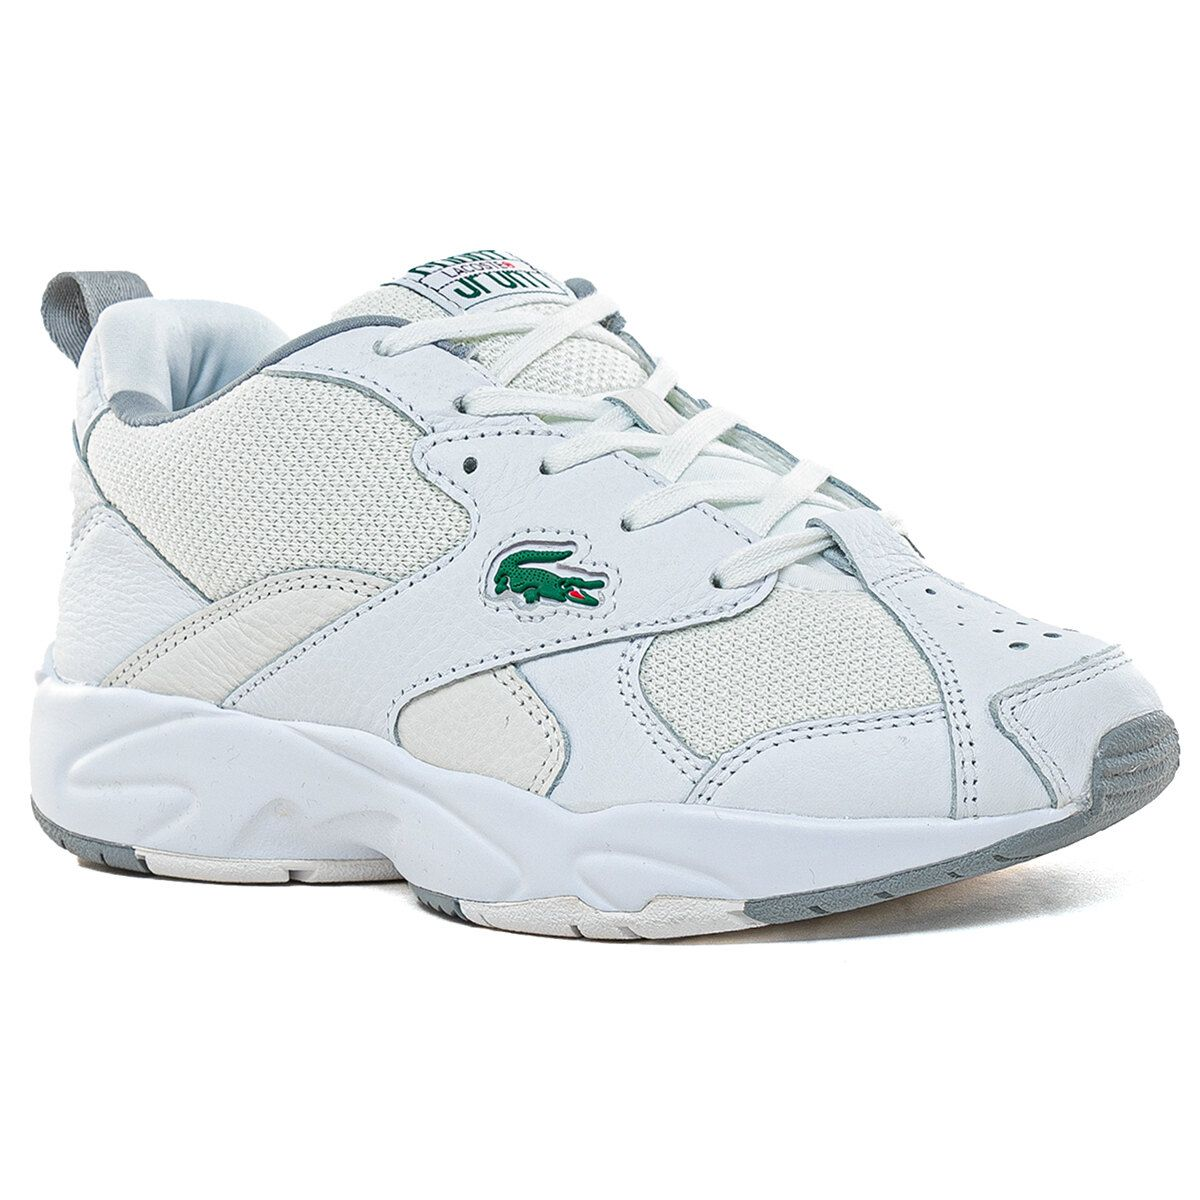 54 Vibram Ideas Vibram Sneakers Sneakers Nike